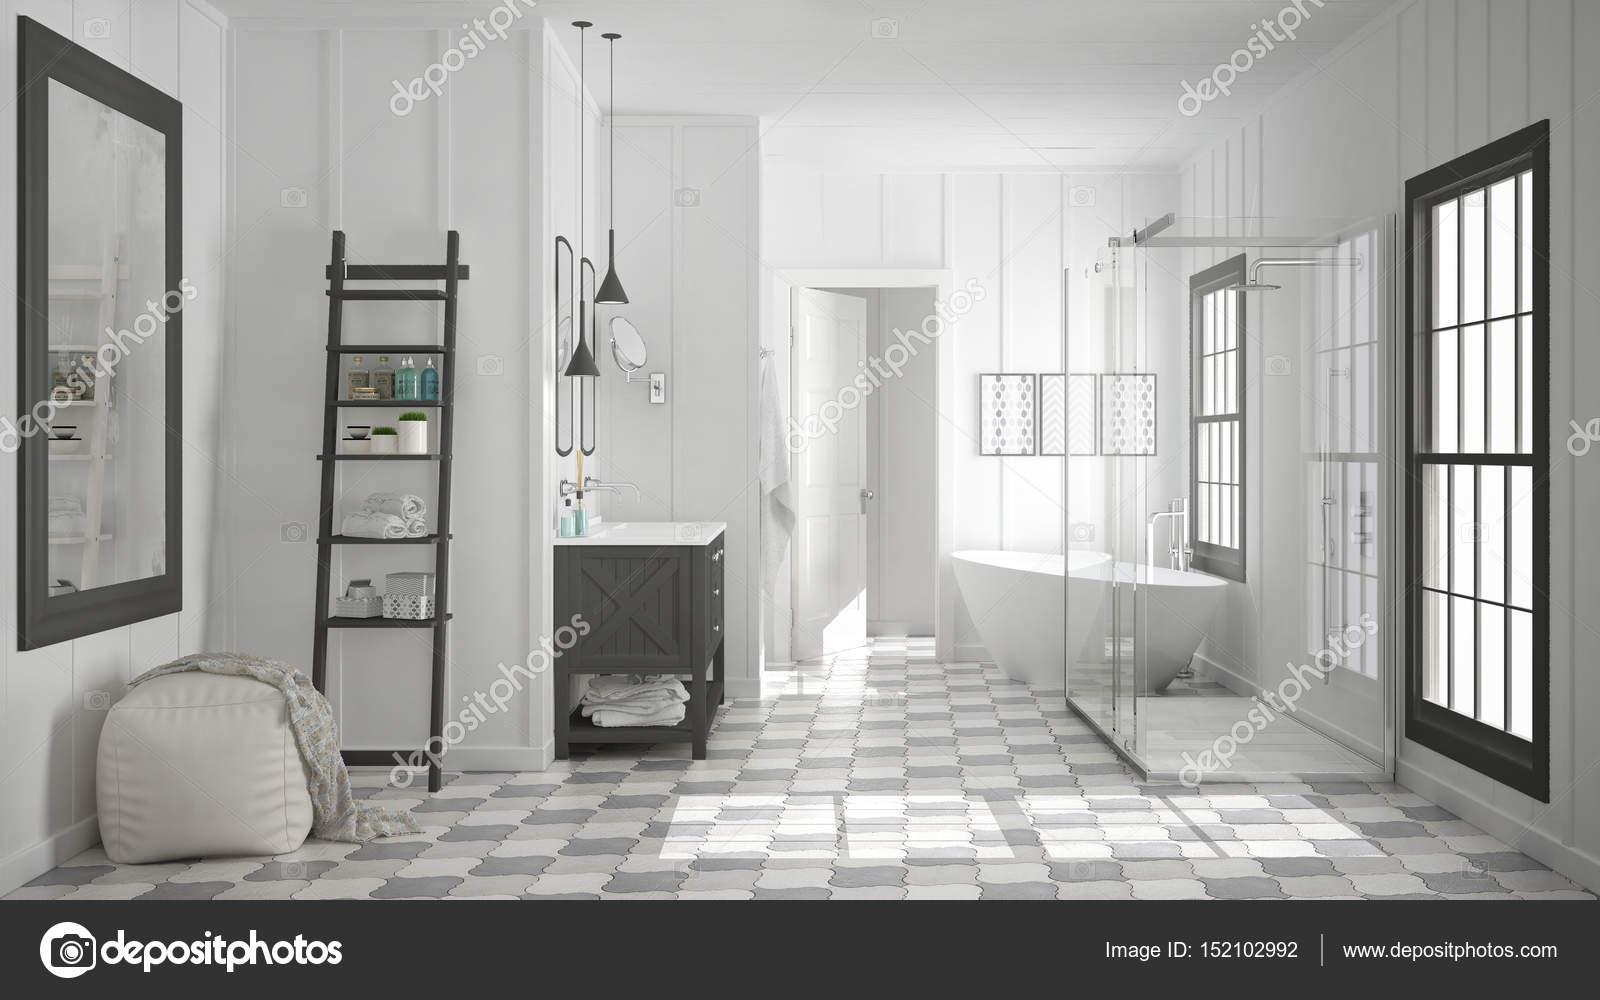 Scandinavo minimalista bianco e grigio bagno doccia vasca da